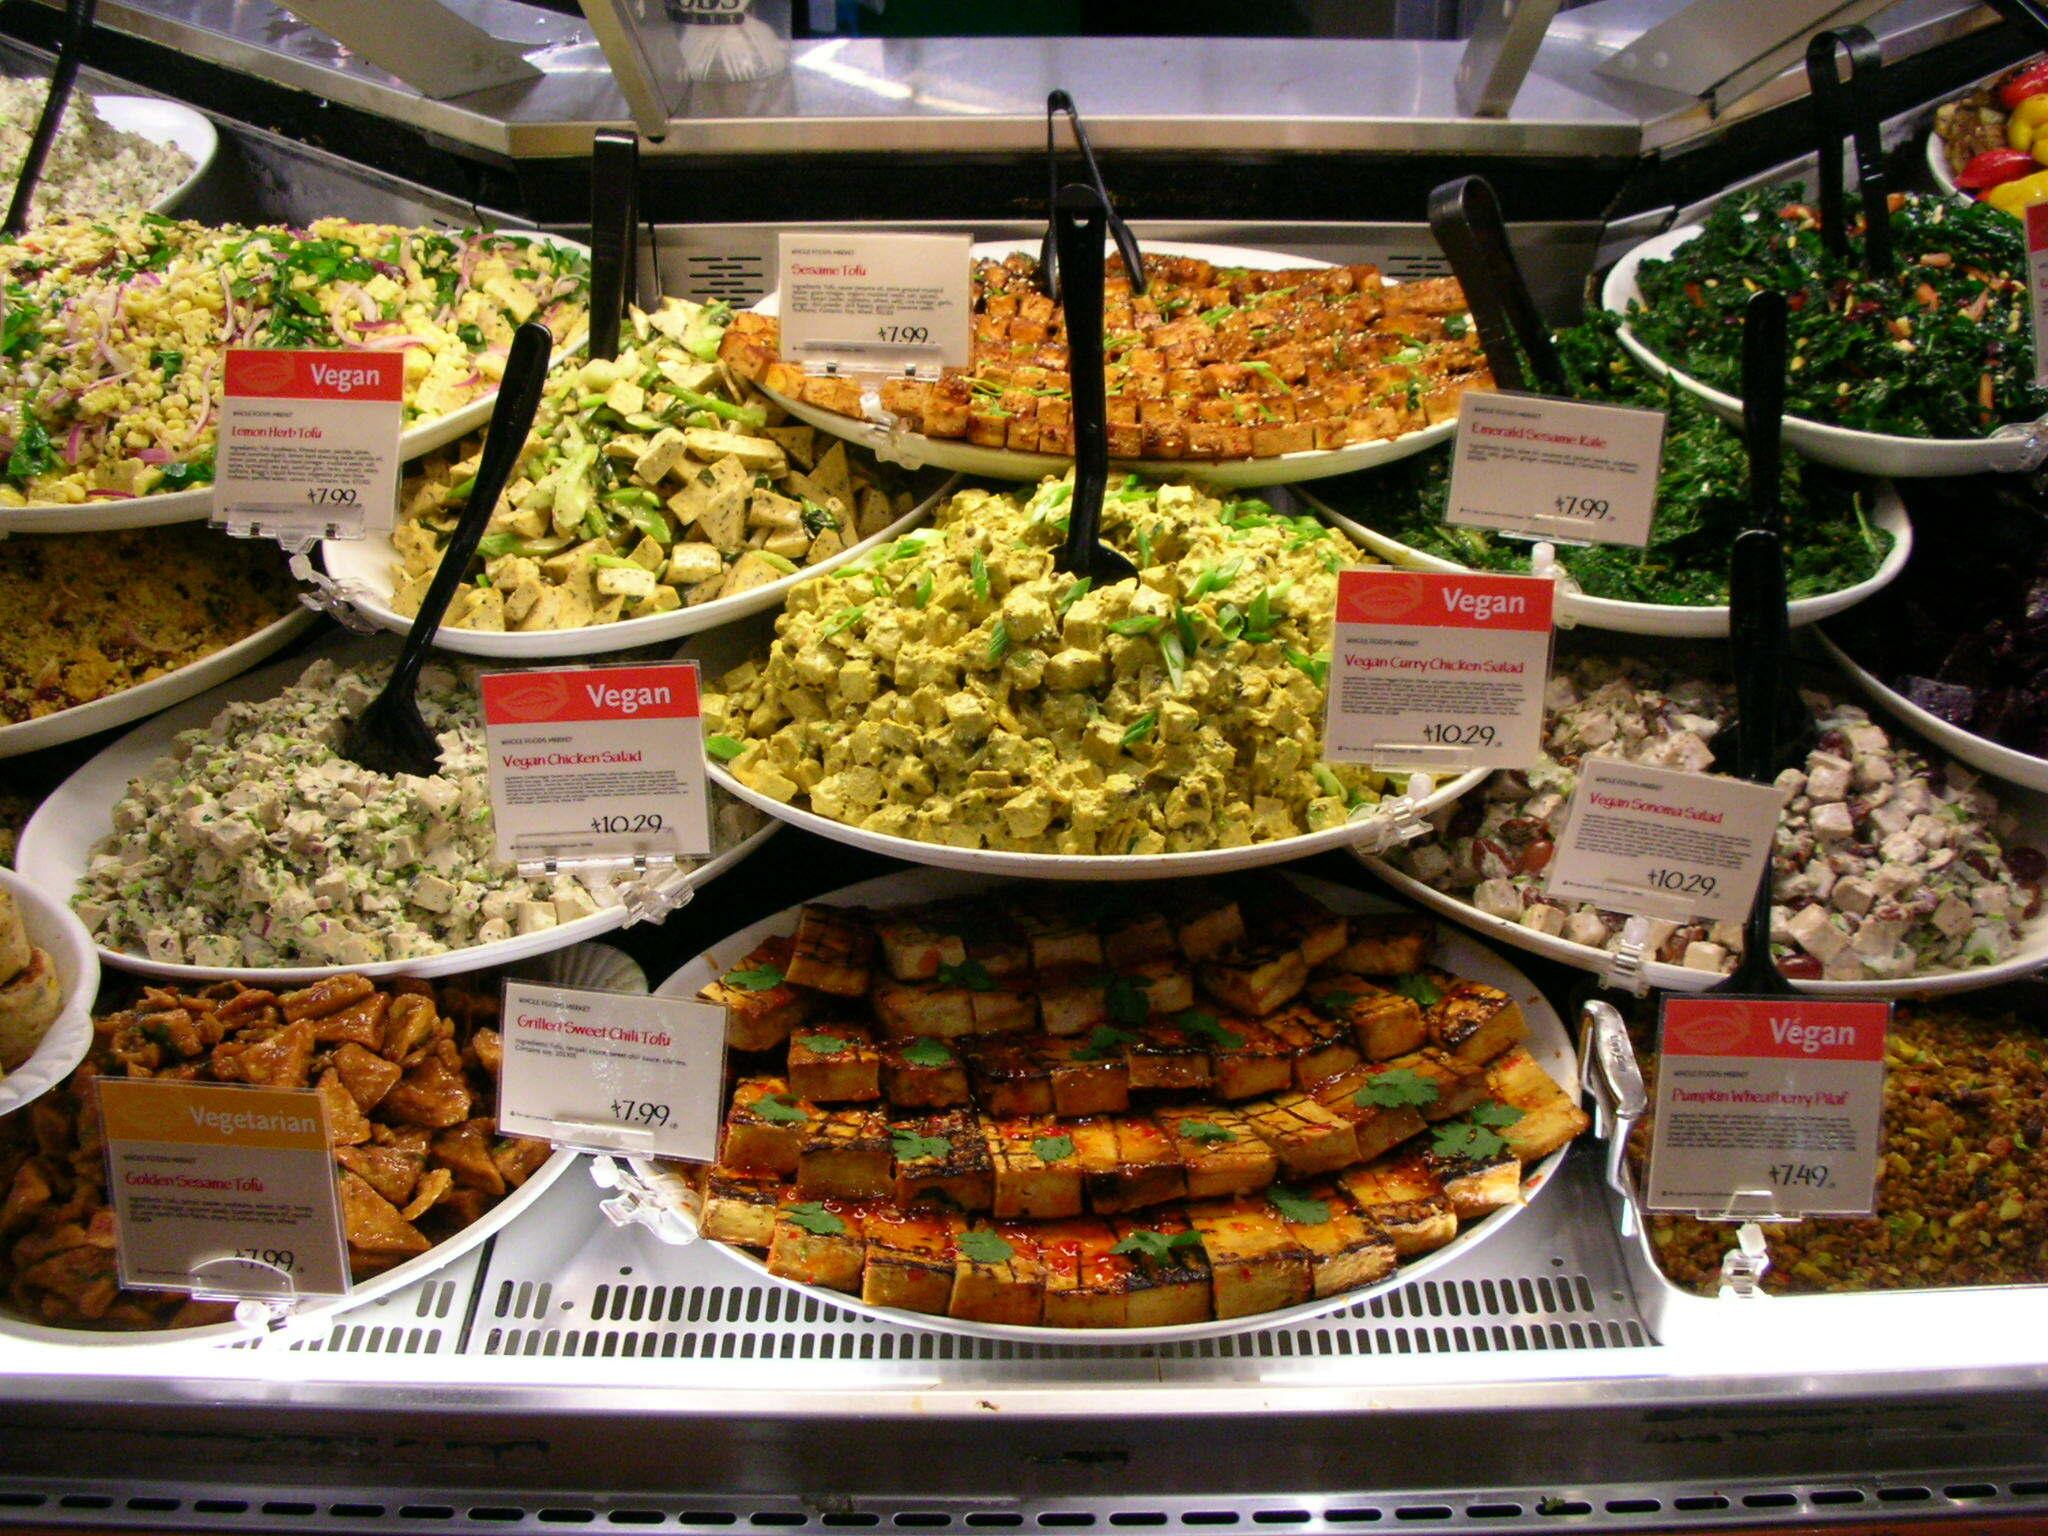 Veganistisch eten. Foto: wikimedia common